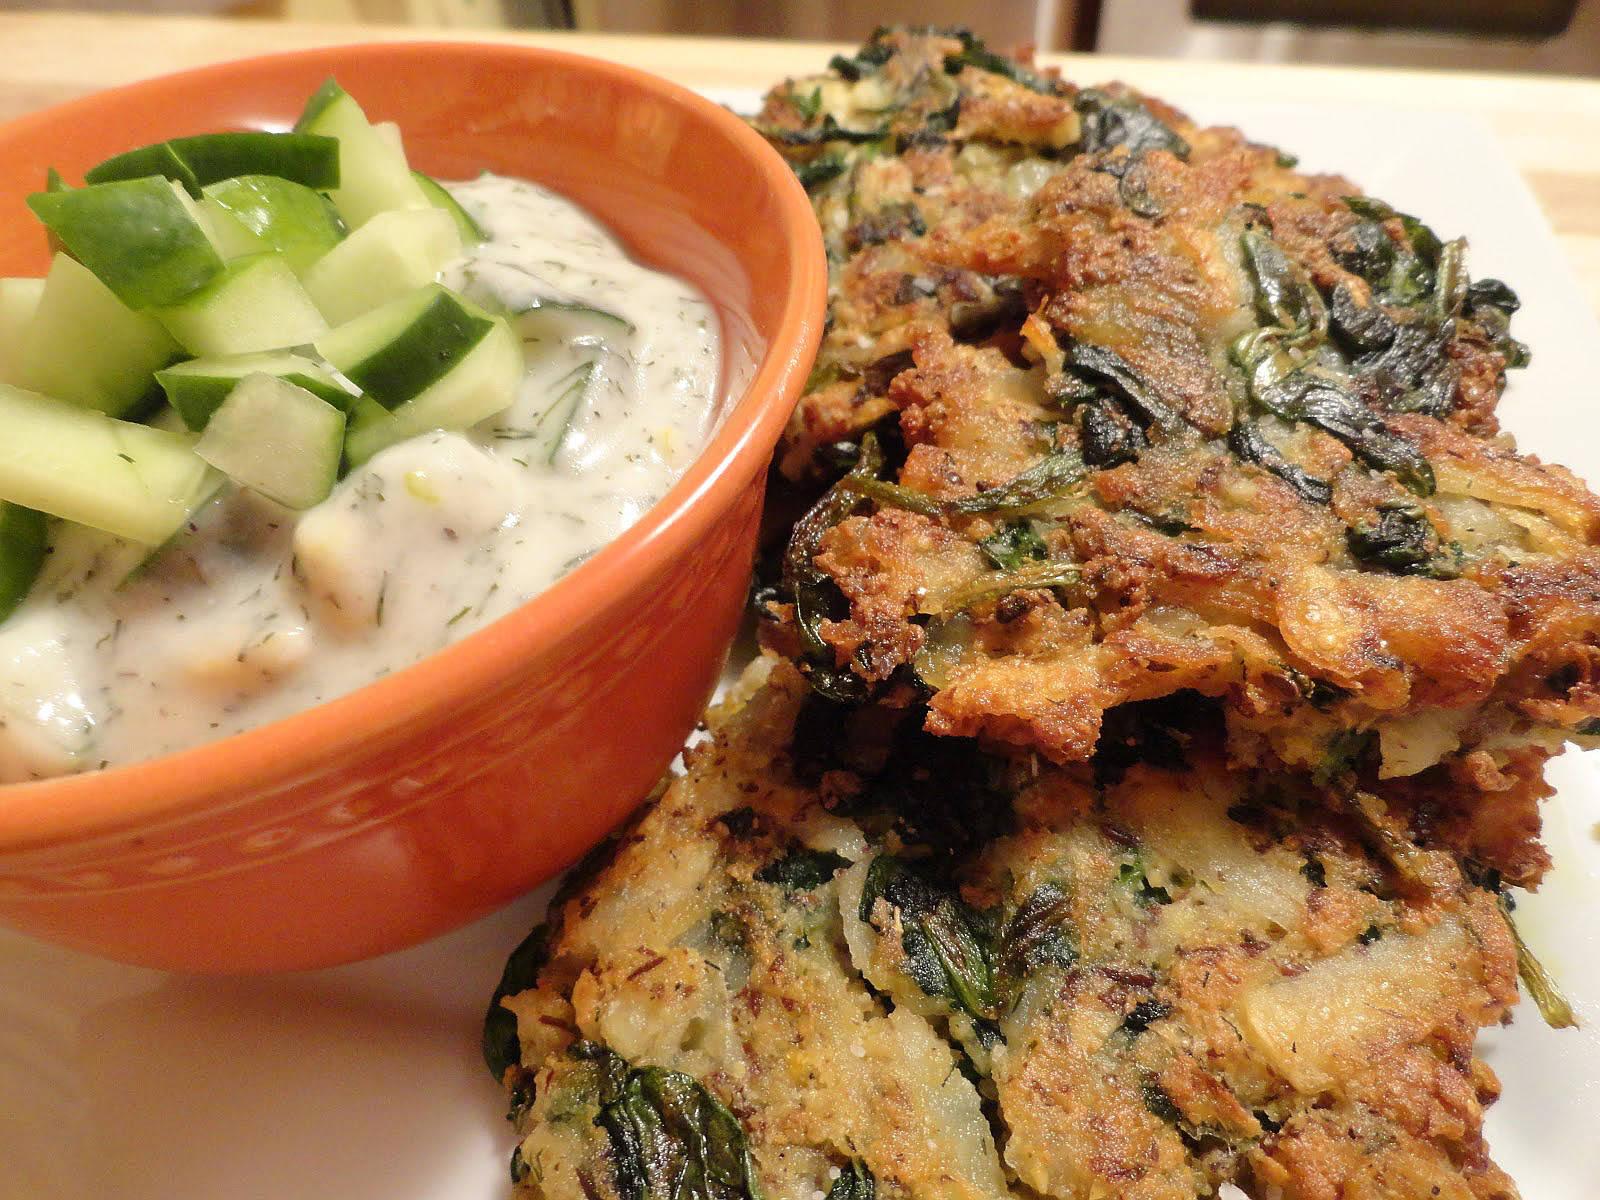 5 Vegan Latke Recipes Just in Time for Hanukkah! - One ...